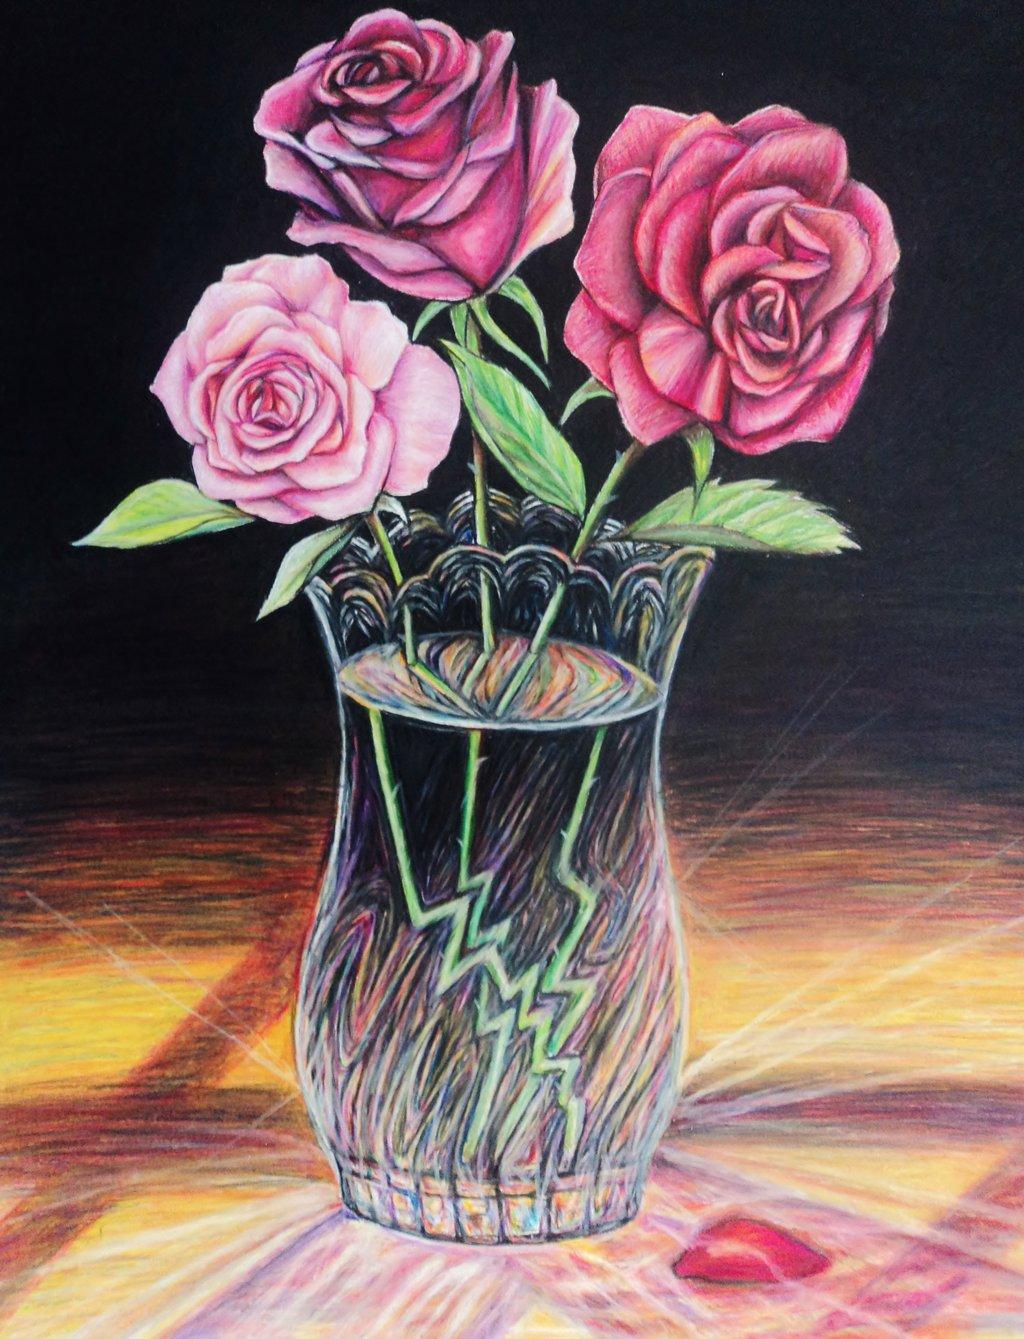 Drawn rose glass vase By vase Glass Glass NgaNguyen712